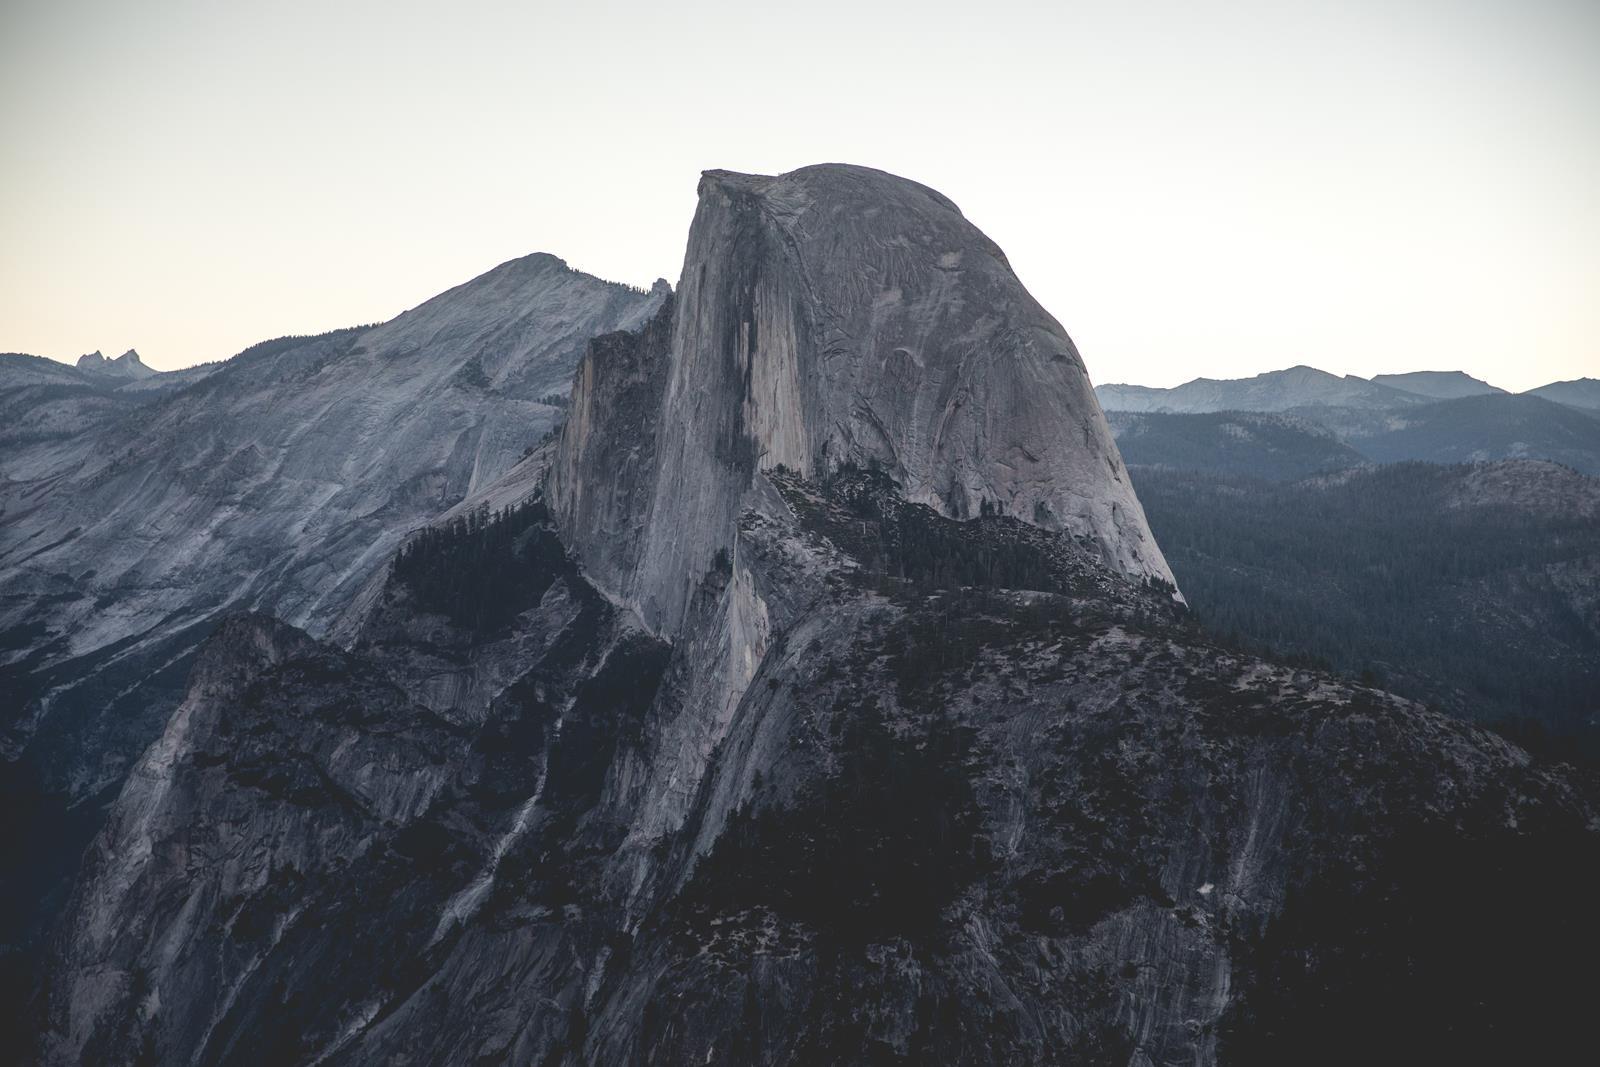 Half Dome in Yosemite National Park at dusk.